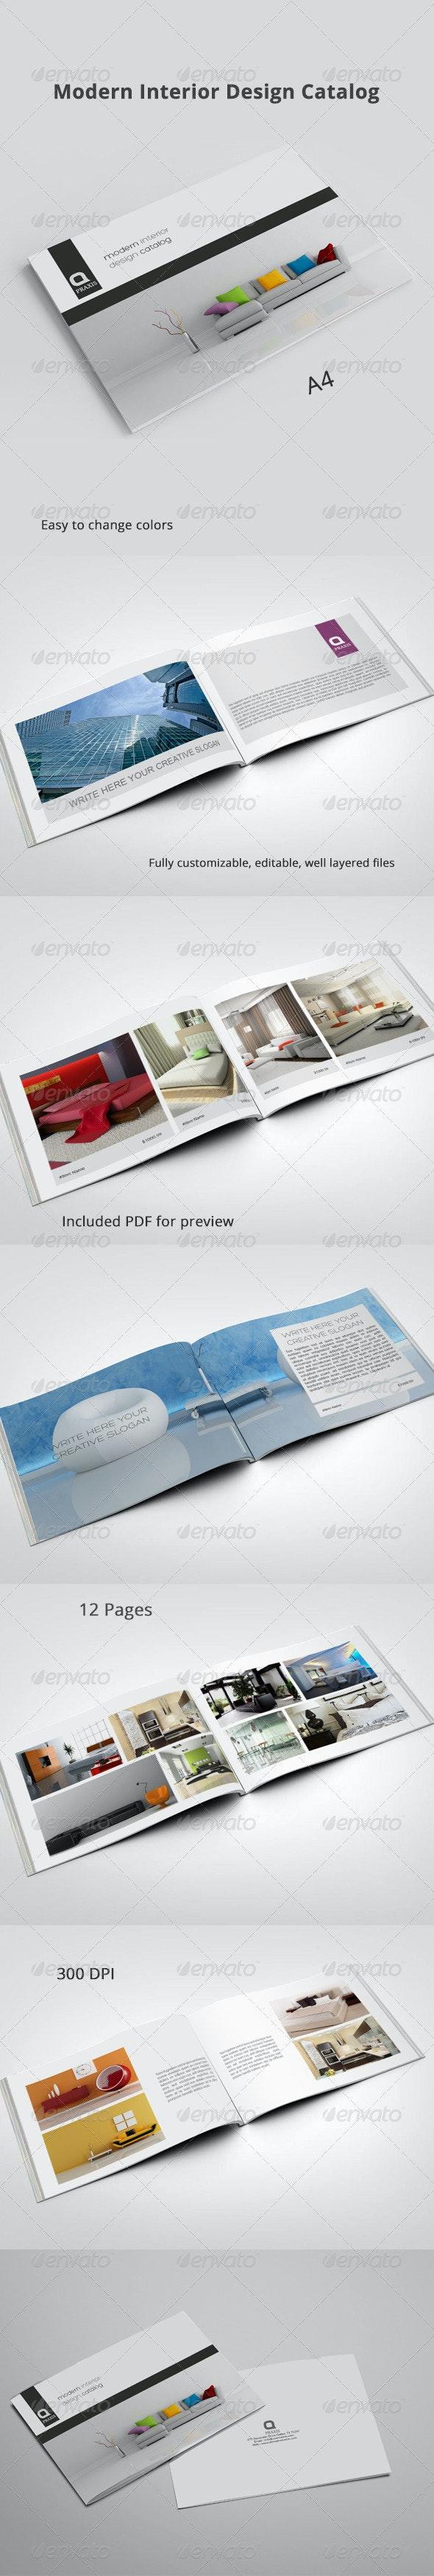 Modern Interior Design Catalog - Catalogs Brochures